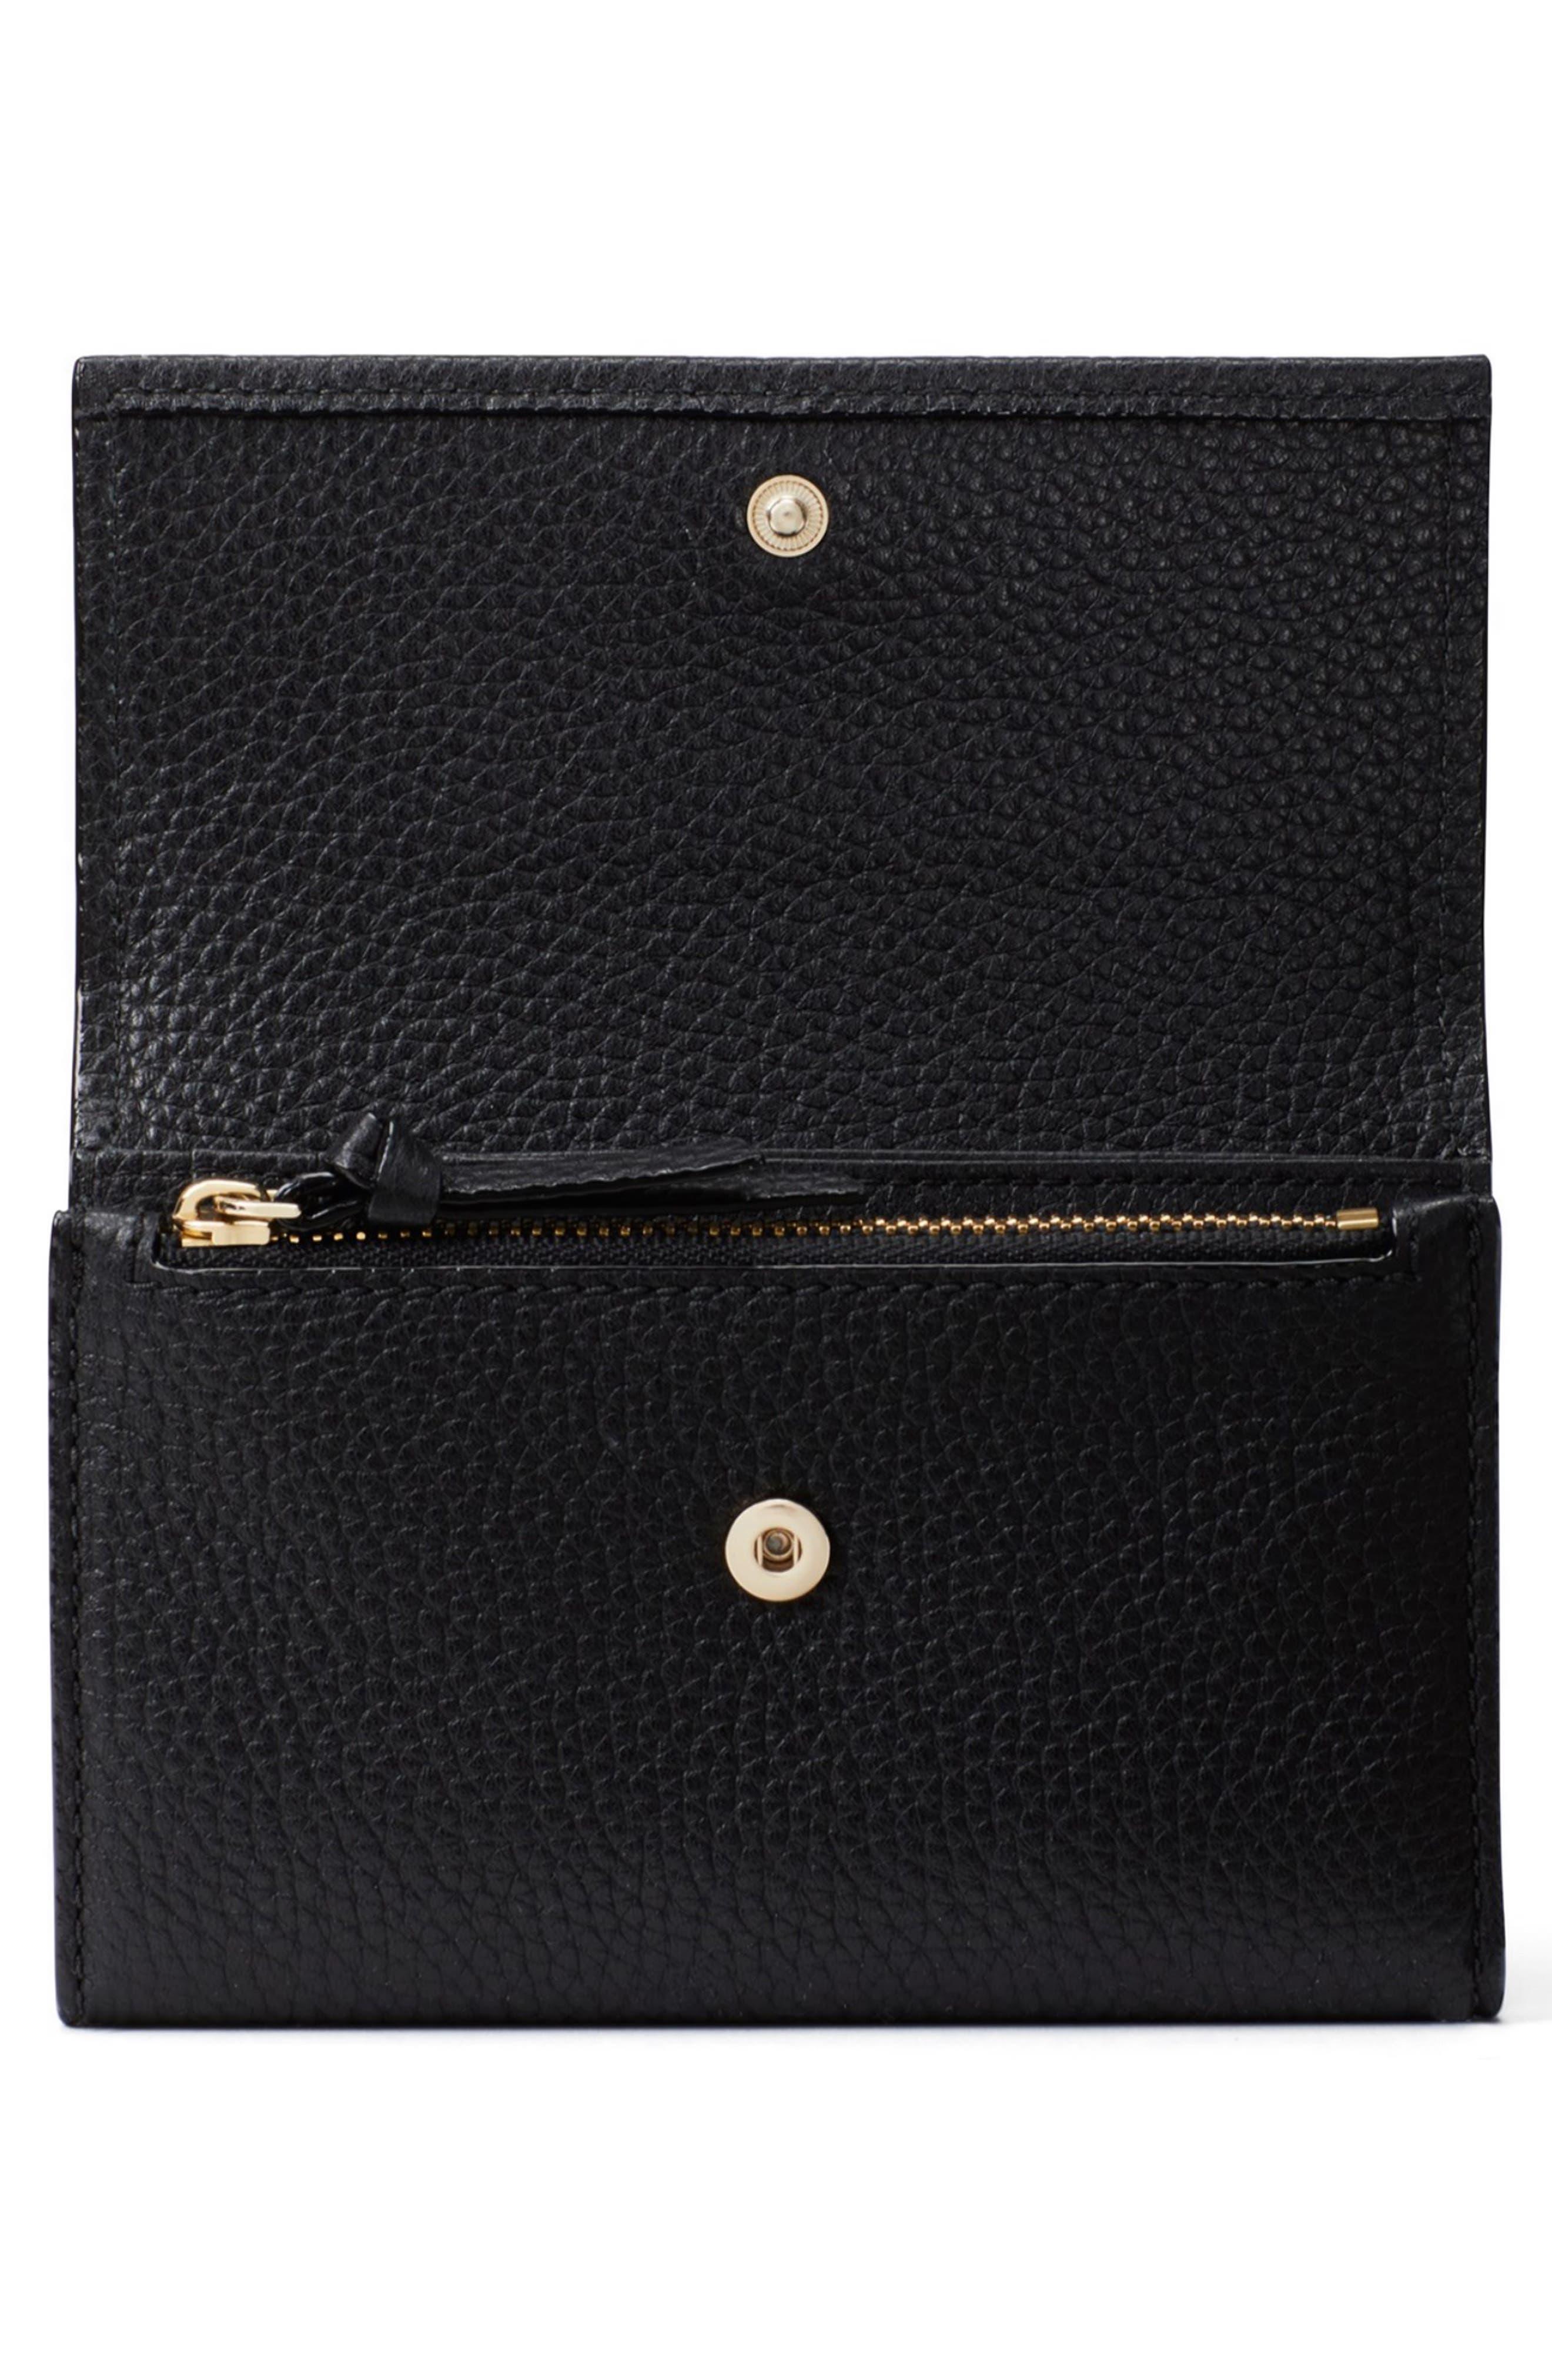 KATE SPADE NEW YORK, jackson street – meredith leather wallet, Alternate thumbnail 5, color, 001